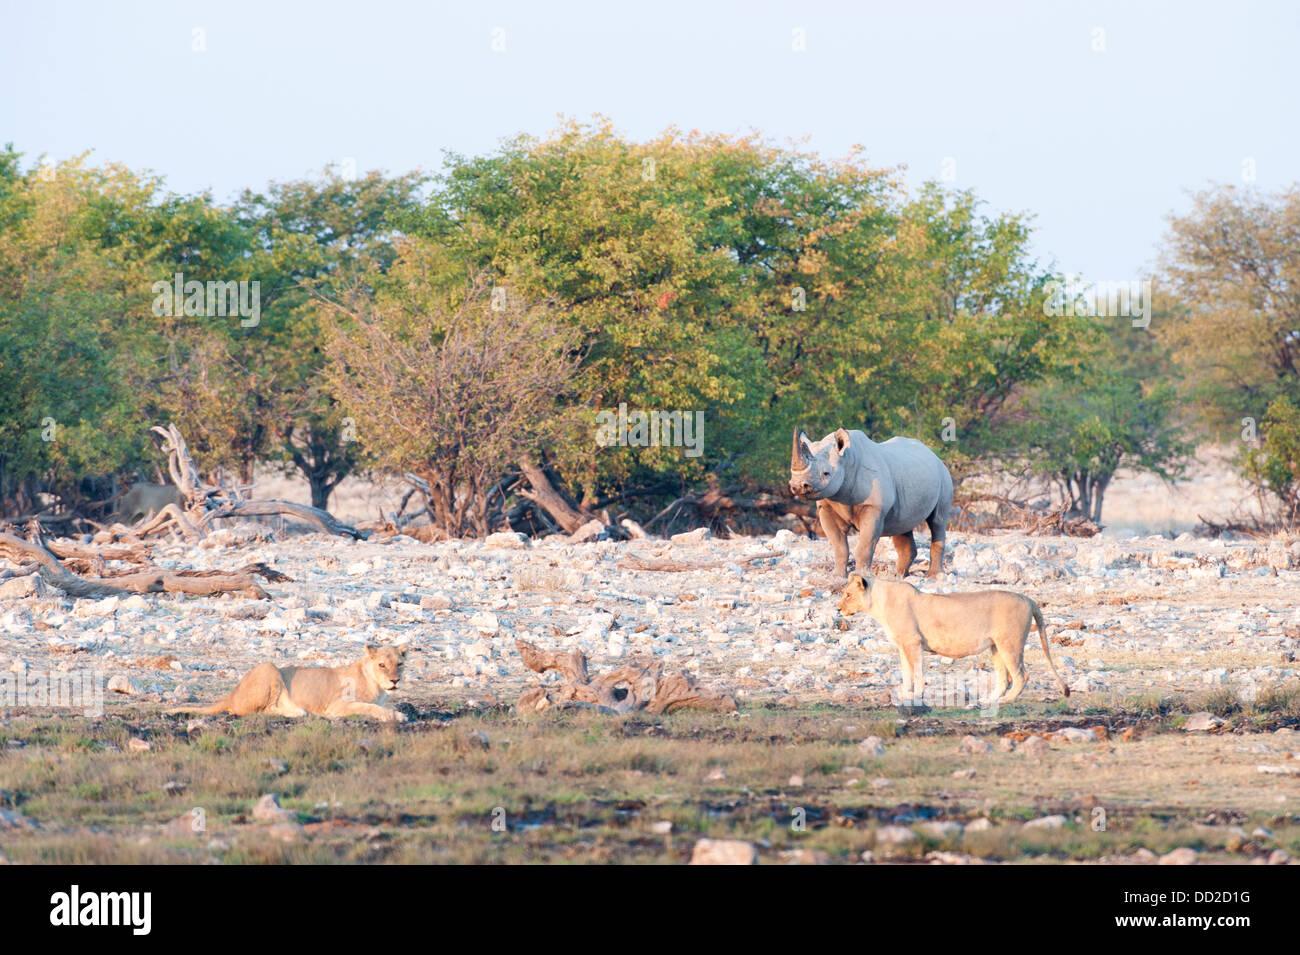 Black rhino (Diceros bicornis) and two a lionesses (Panthera leo), Rietfontein waterhole in Etosha Nationalpark, - Stock Image